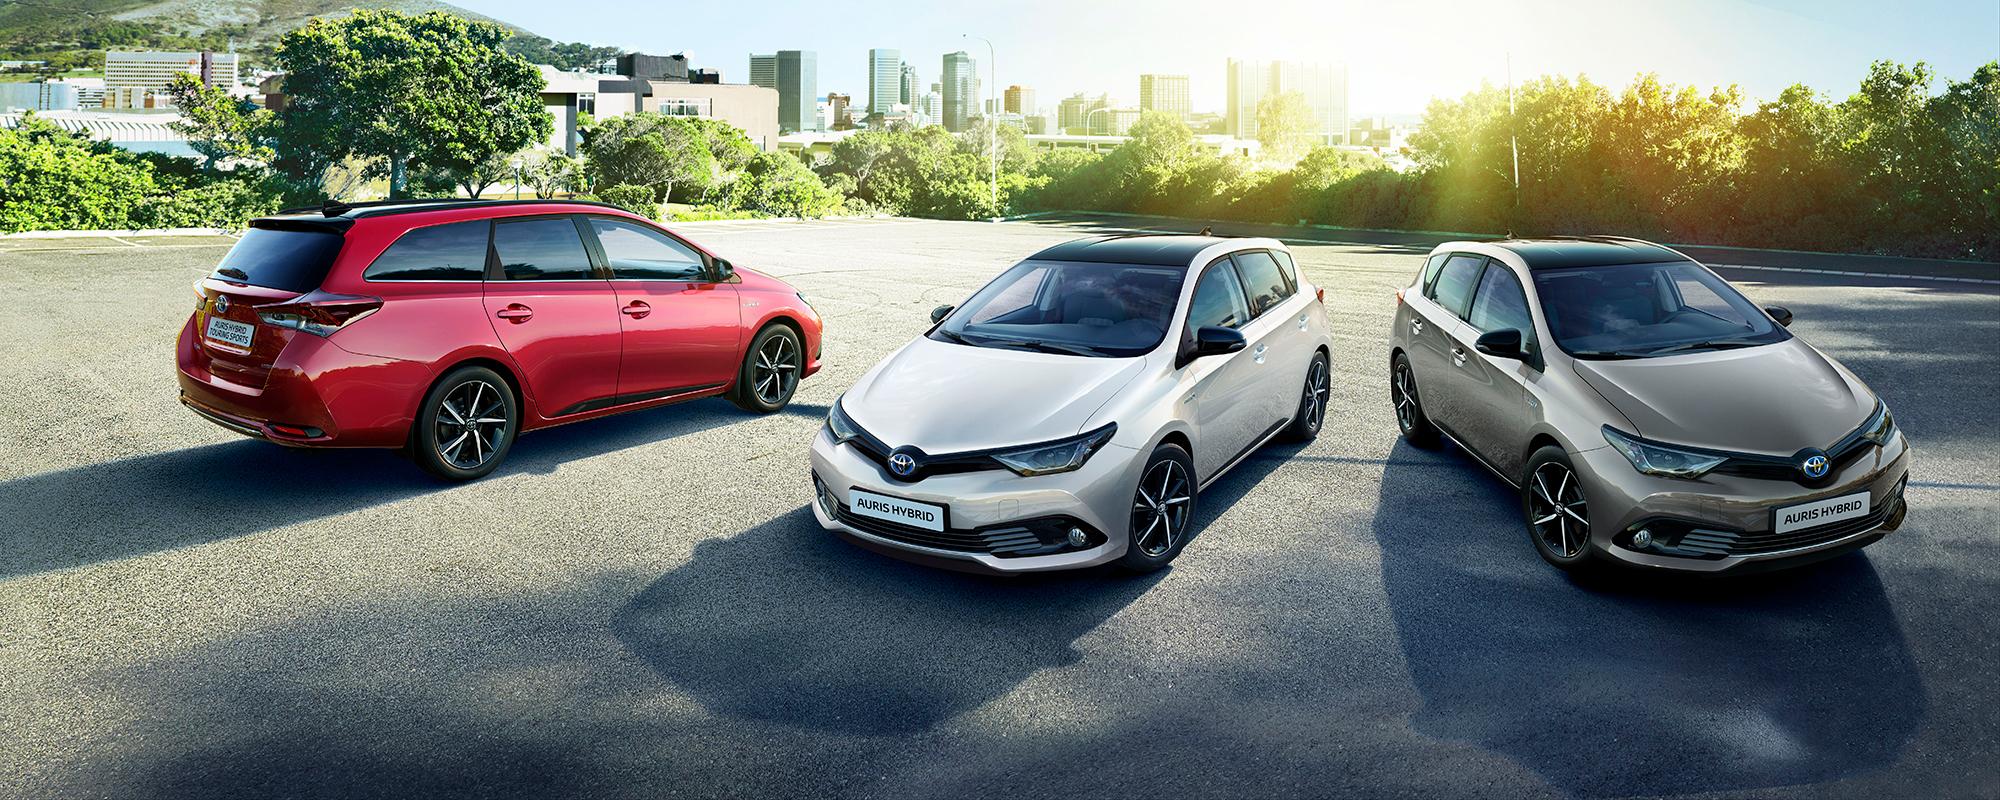 Toyota Auris nu ook als extra stijlvolle Black Edition